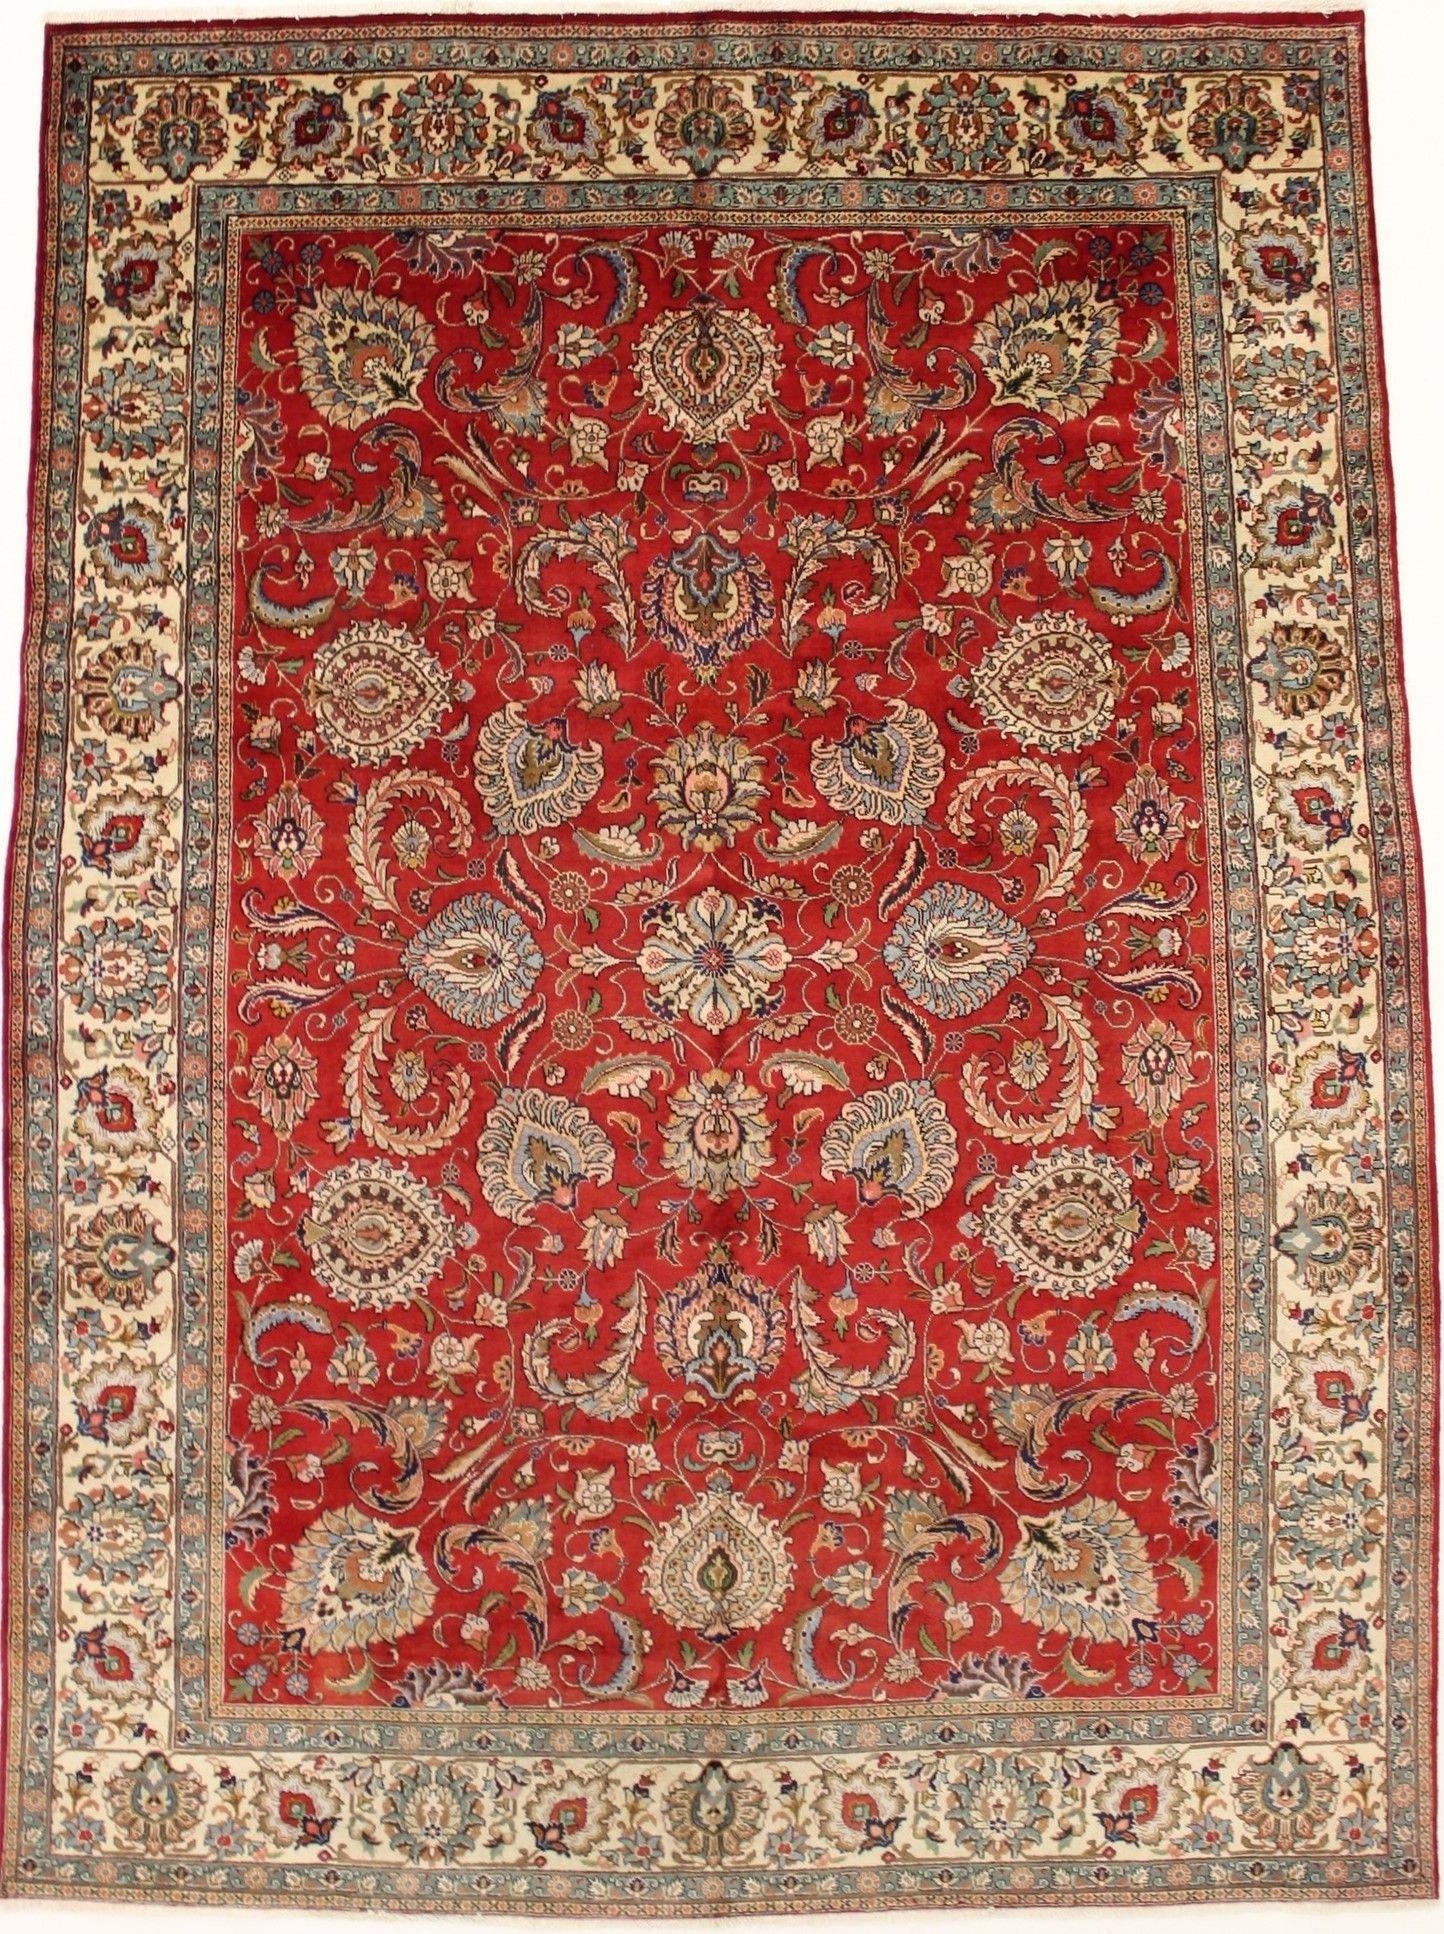 Pin By Nightspore On سجاد Handmade Persian Rugs Rug Store Rugs